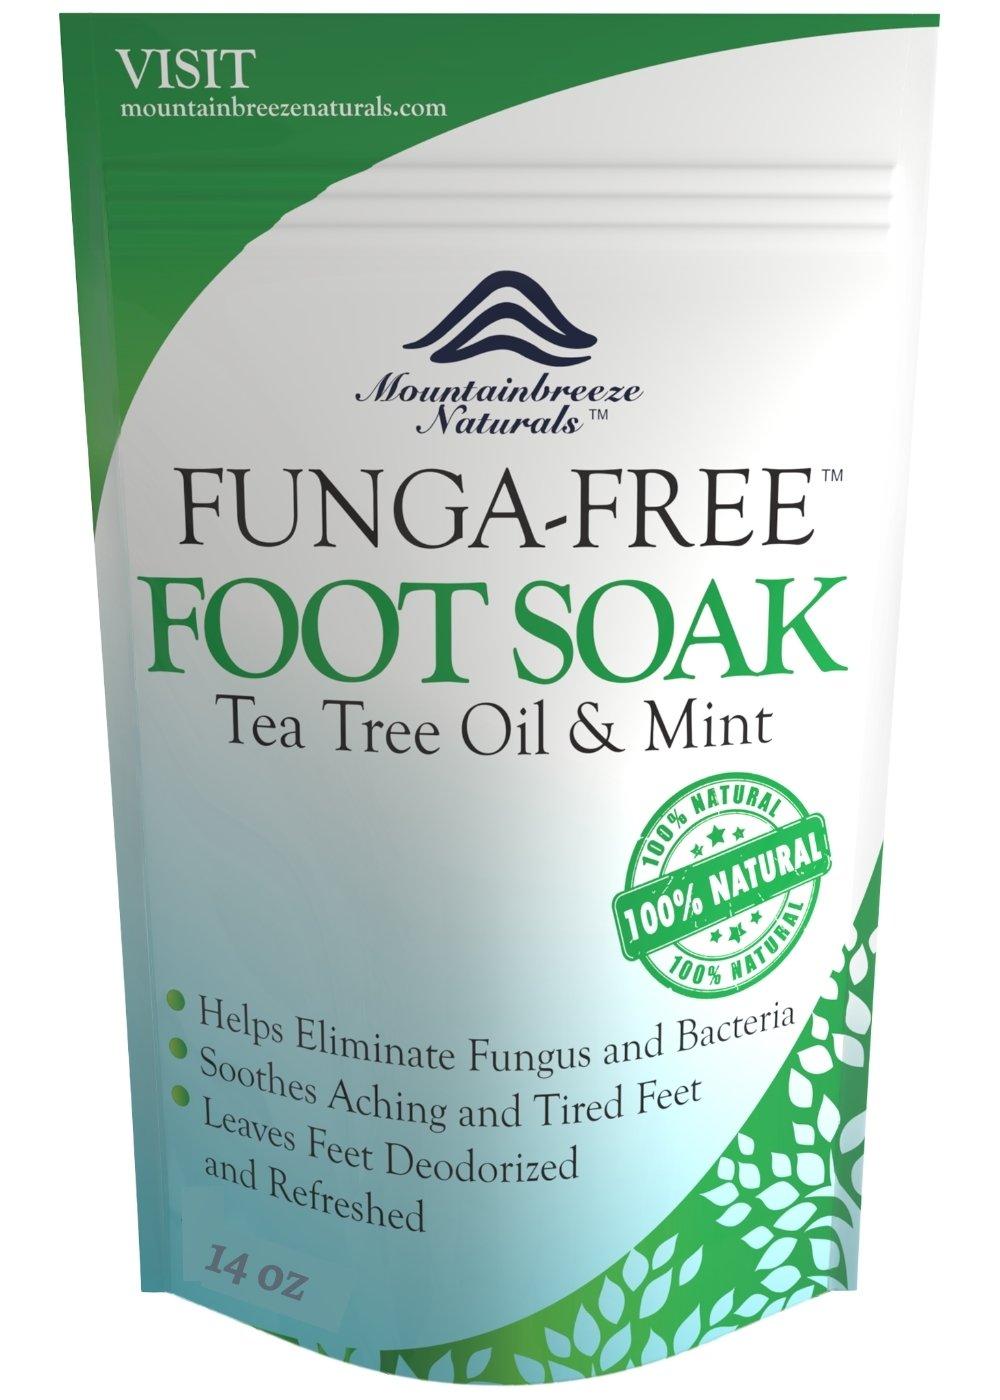 Tea Tree Oil Foot Soak With Epsom Salt, Antifungal Foot Soak Helps Away Toenail Fungus, Athletes Foot & Stubborn Foot Odor - Softens Calluses & Soothes Sore Tired Feet, 14 Ounce